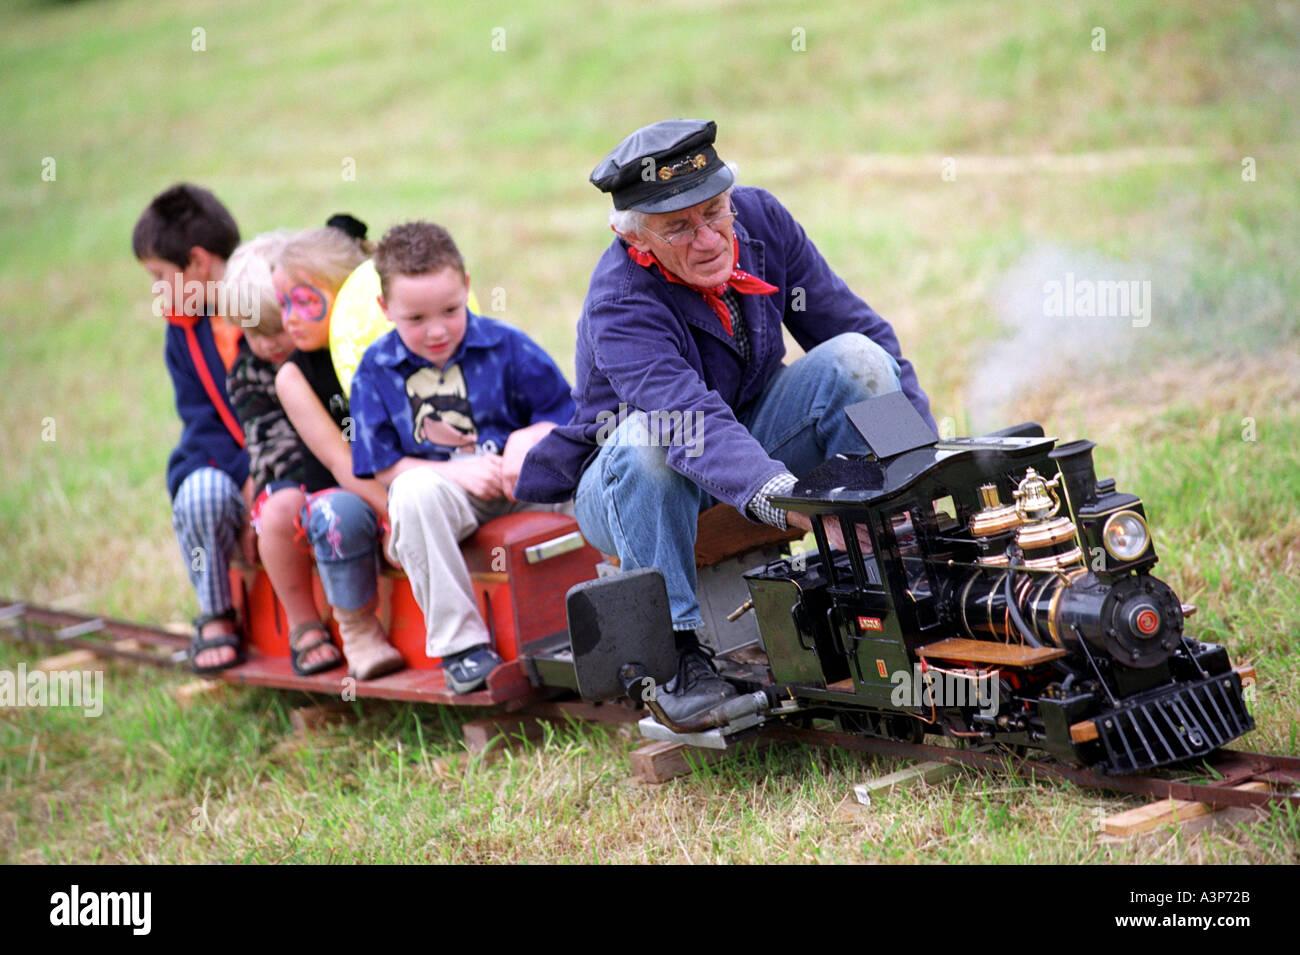 A model steam train taking children for a ride at a village fete in Dorset Britain UK Stock Photo